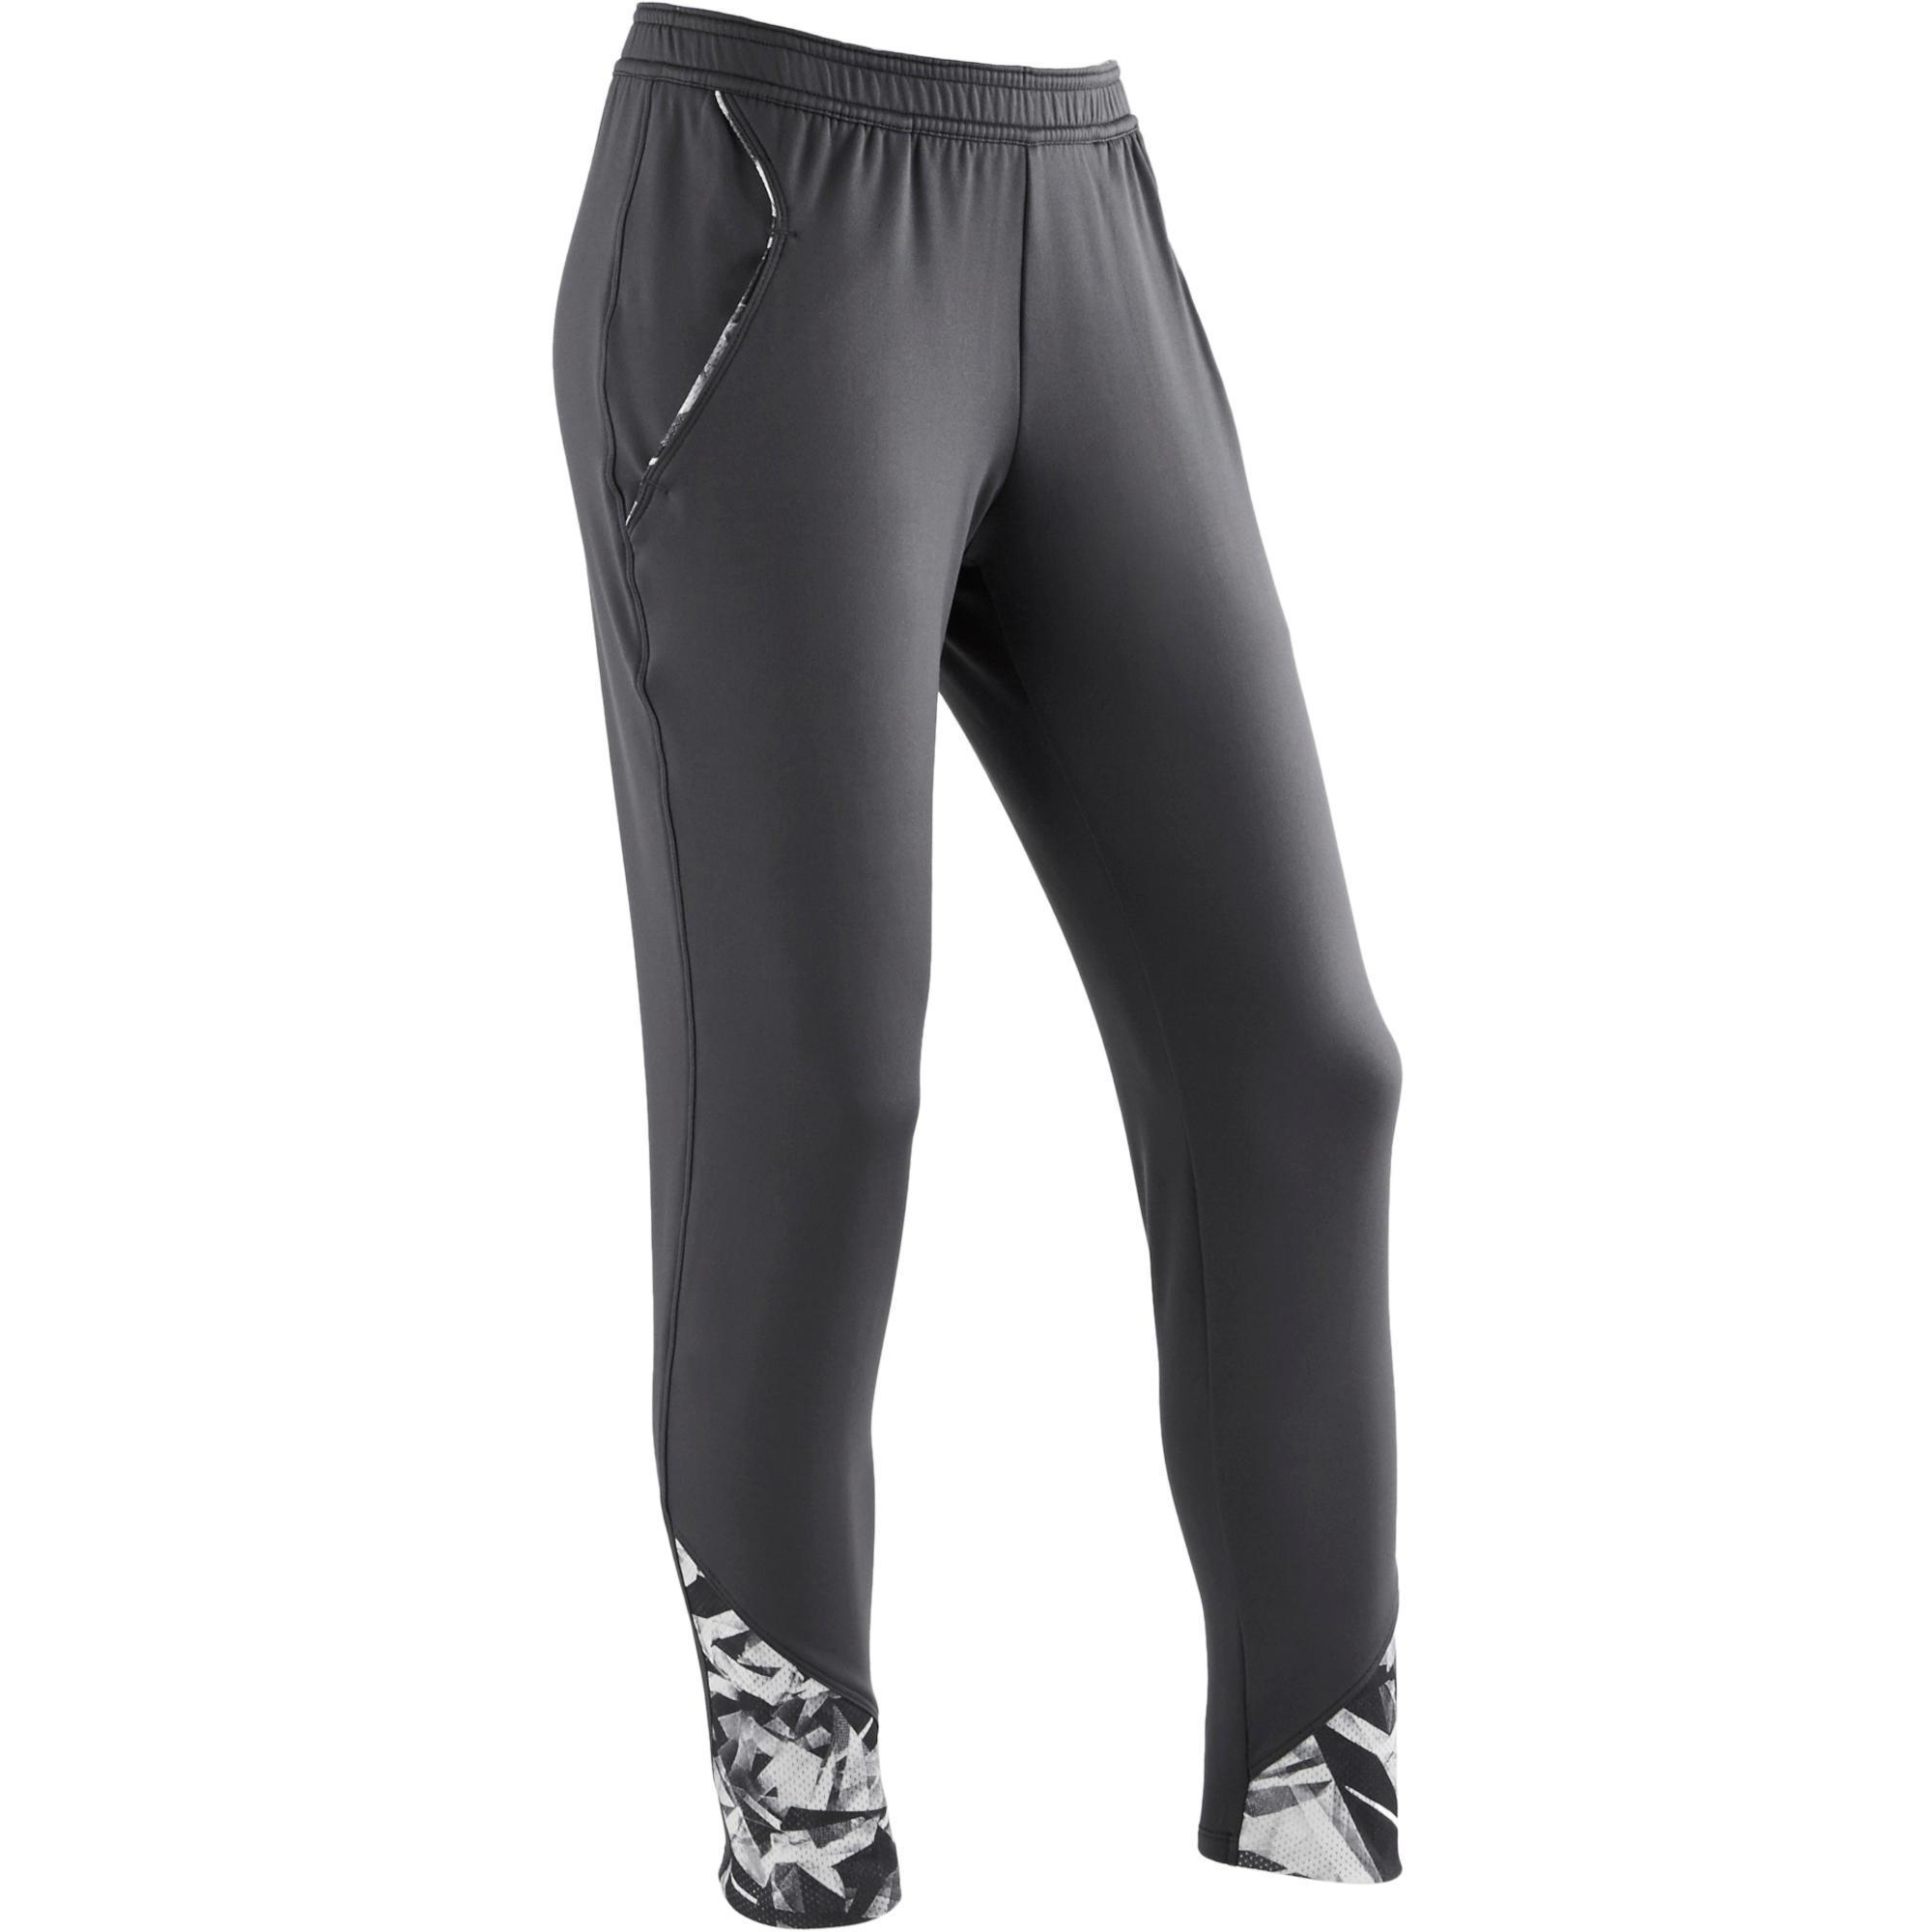 pantalon s900 gym fille gris domyos by decathlon. Black Bedroom Furniture Sets. Home Design Ideas